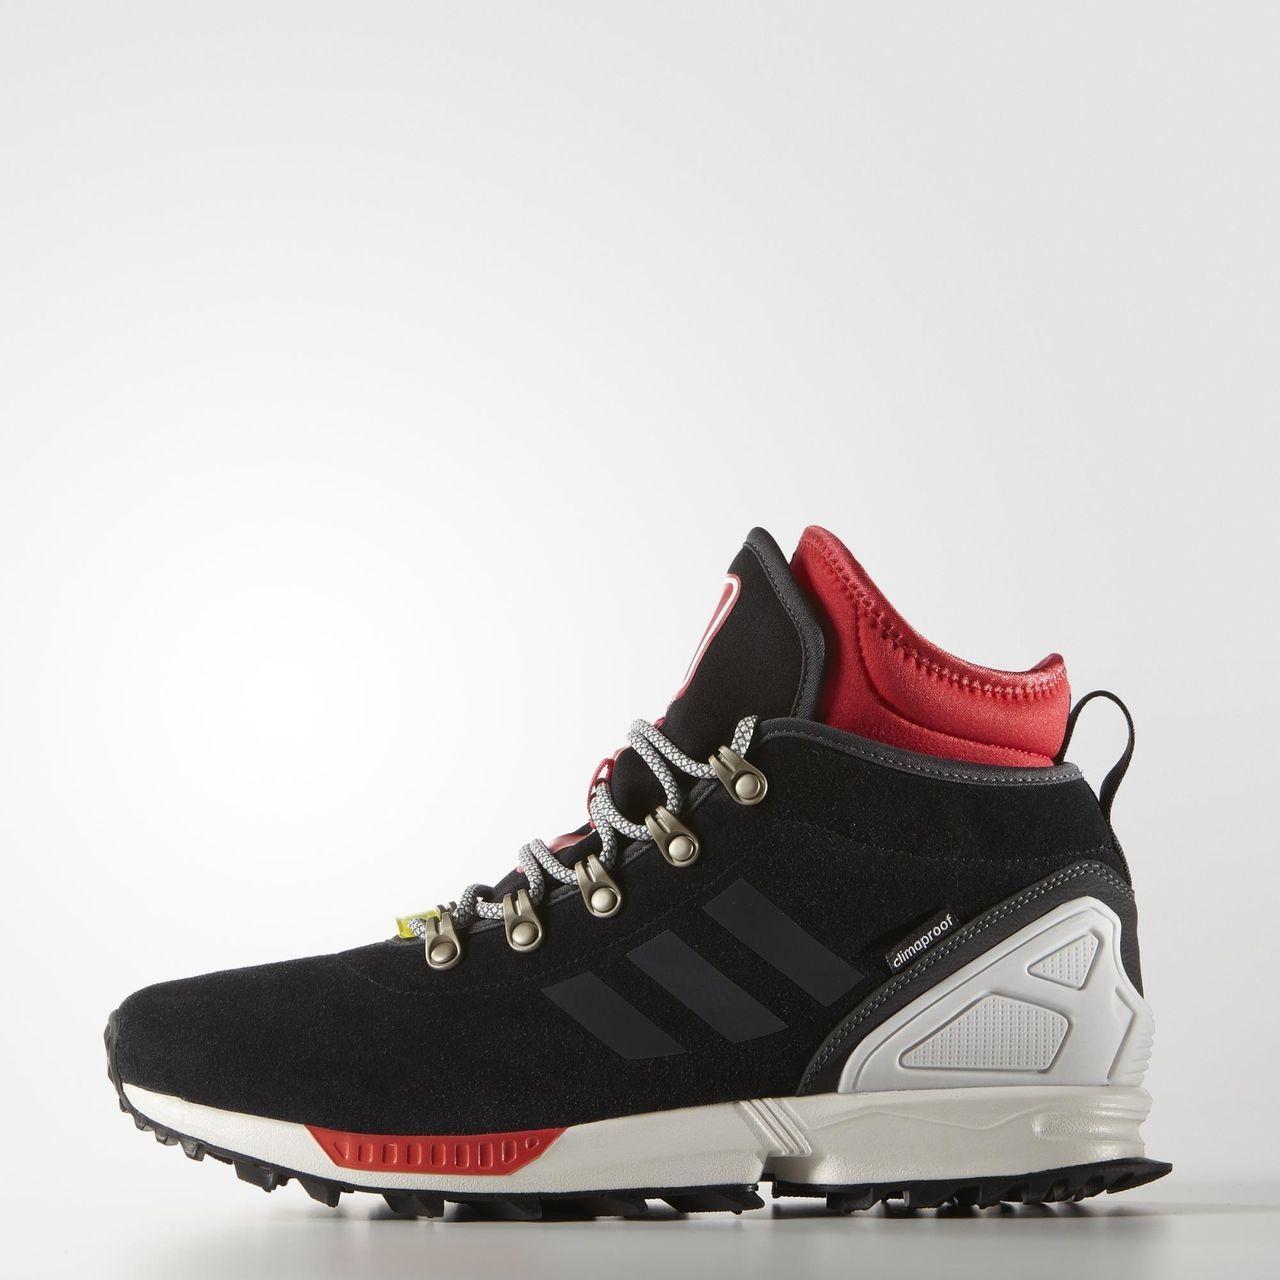 Adidas Zx Flux Winter Core Black Adidas Zx Flux Adidas Sneakers Sneakers